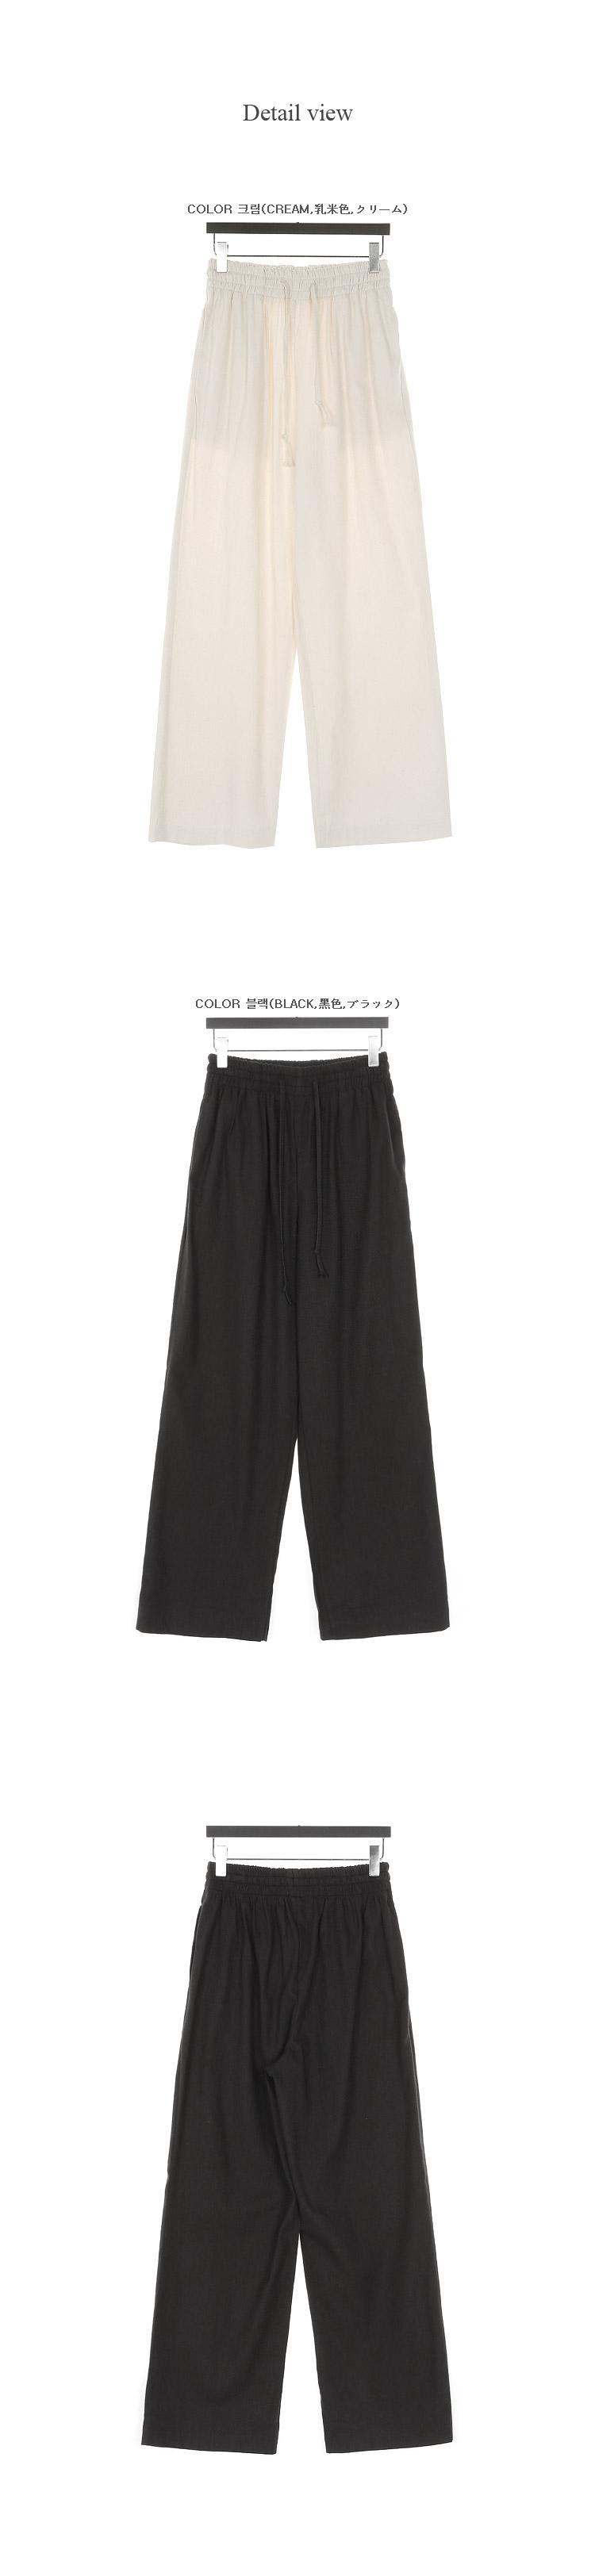 Folding banding pants